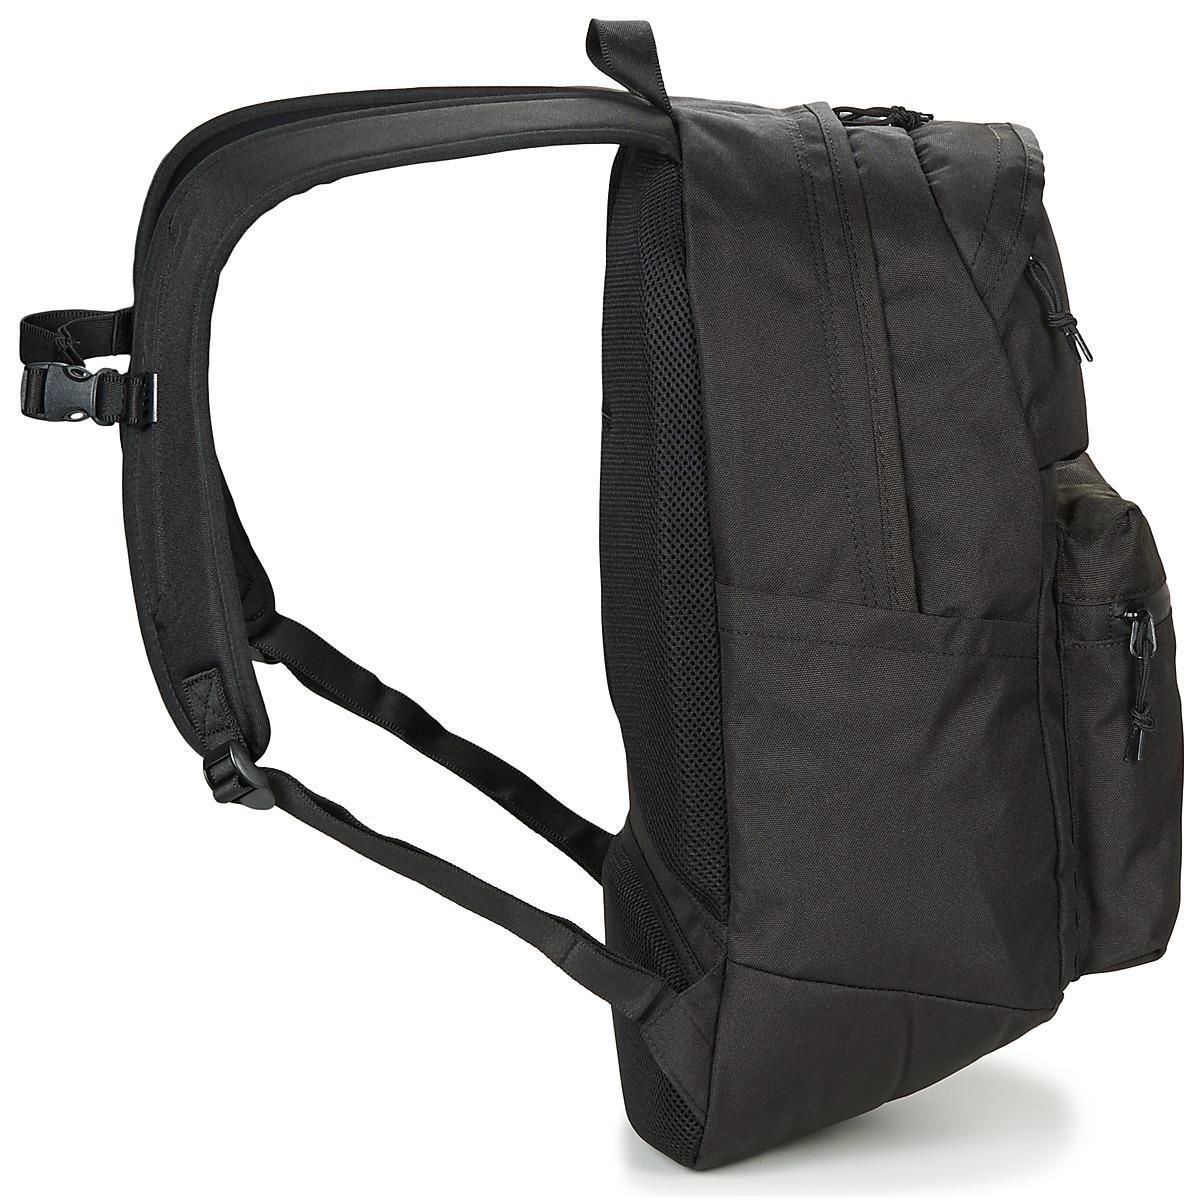 ... Daftar Update Harga Terbaru ... - Lyst Converse Chuck Plus Core Backpack  in Black for Men Source · Gallery. Source · Gallery 6a63fecde6